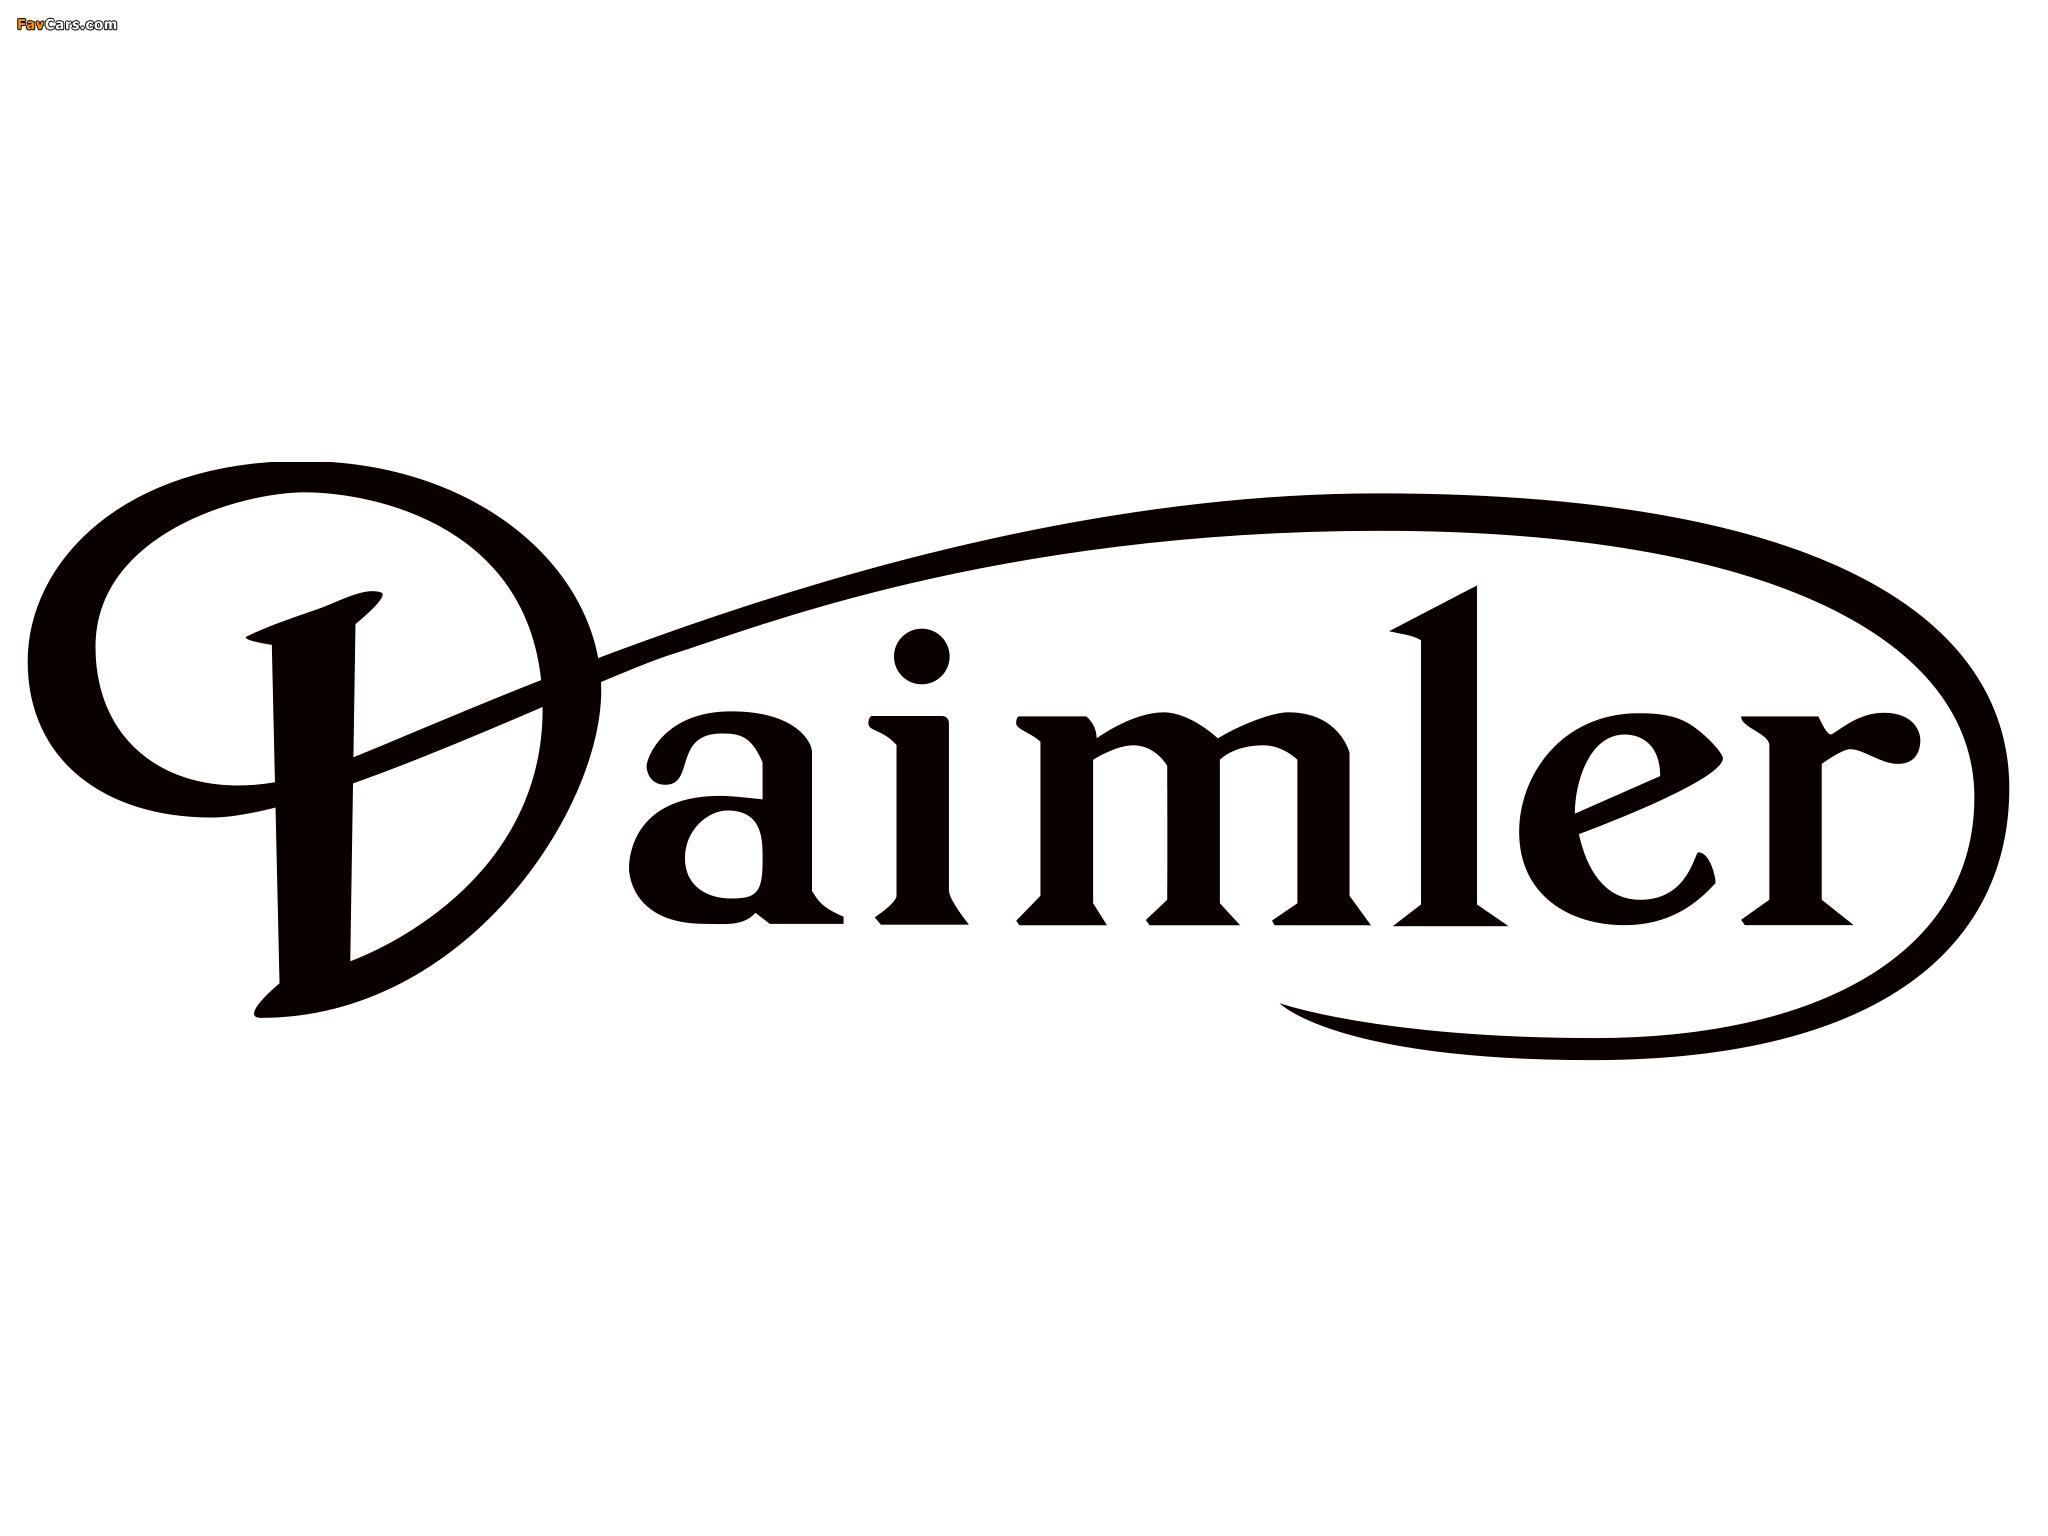 Daimler wallpapers (2048 x 1536)